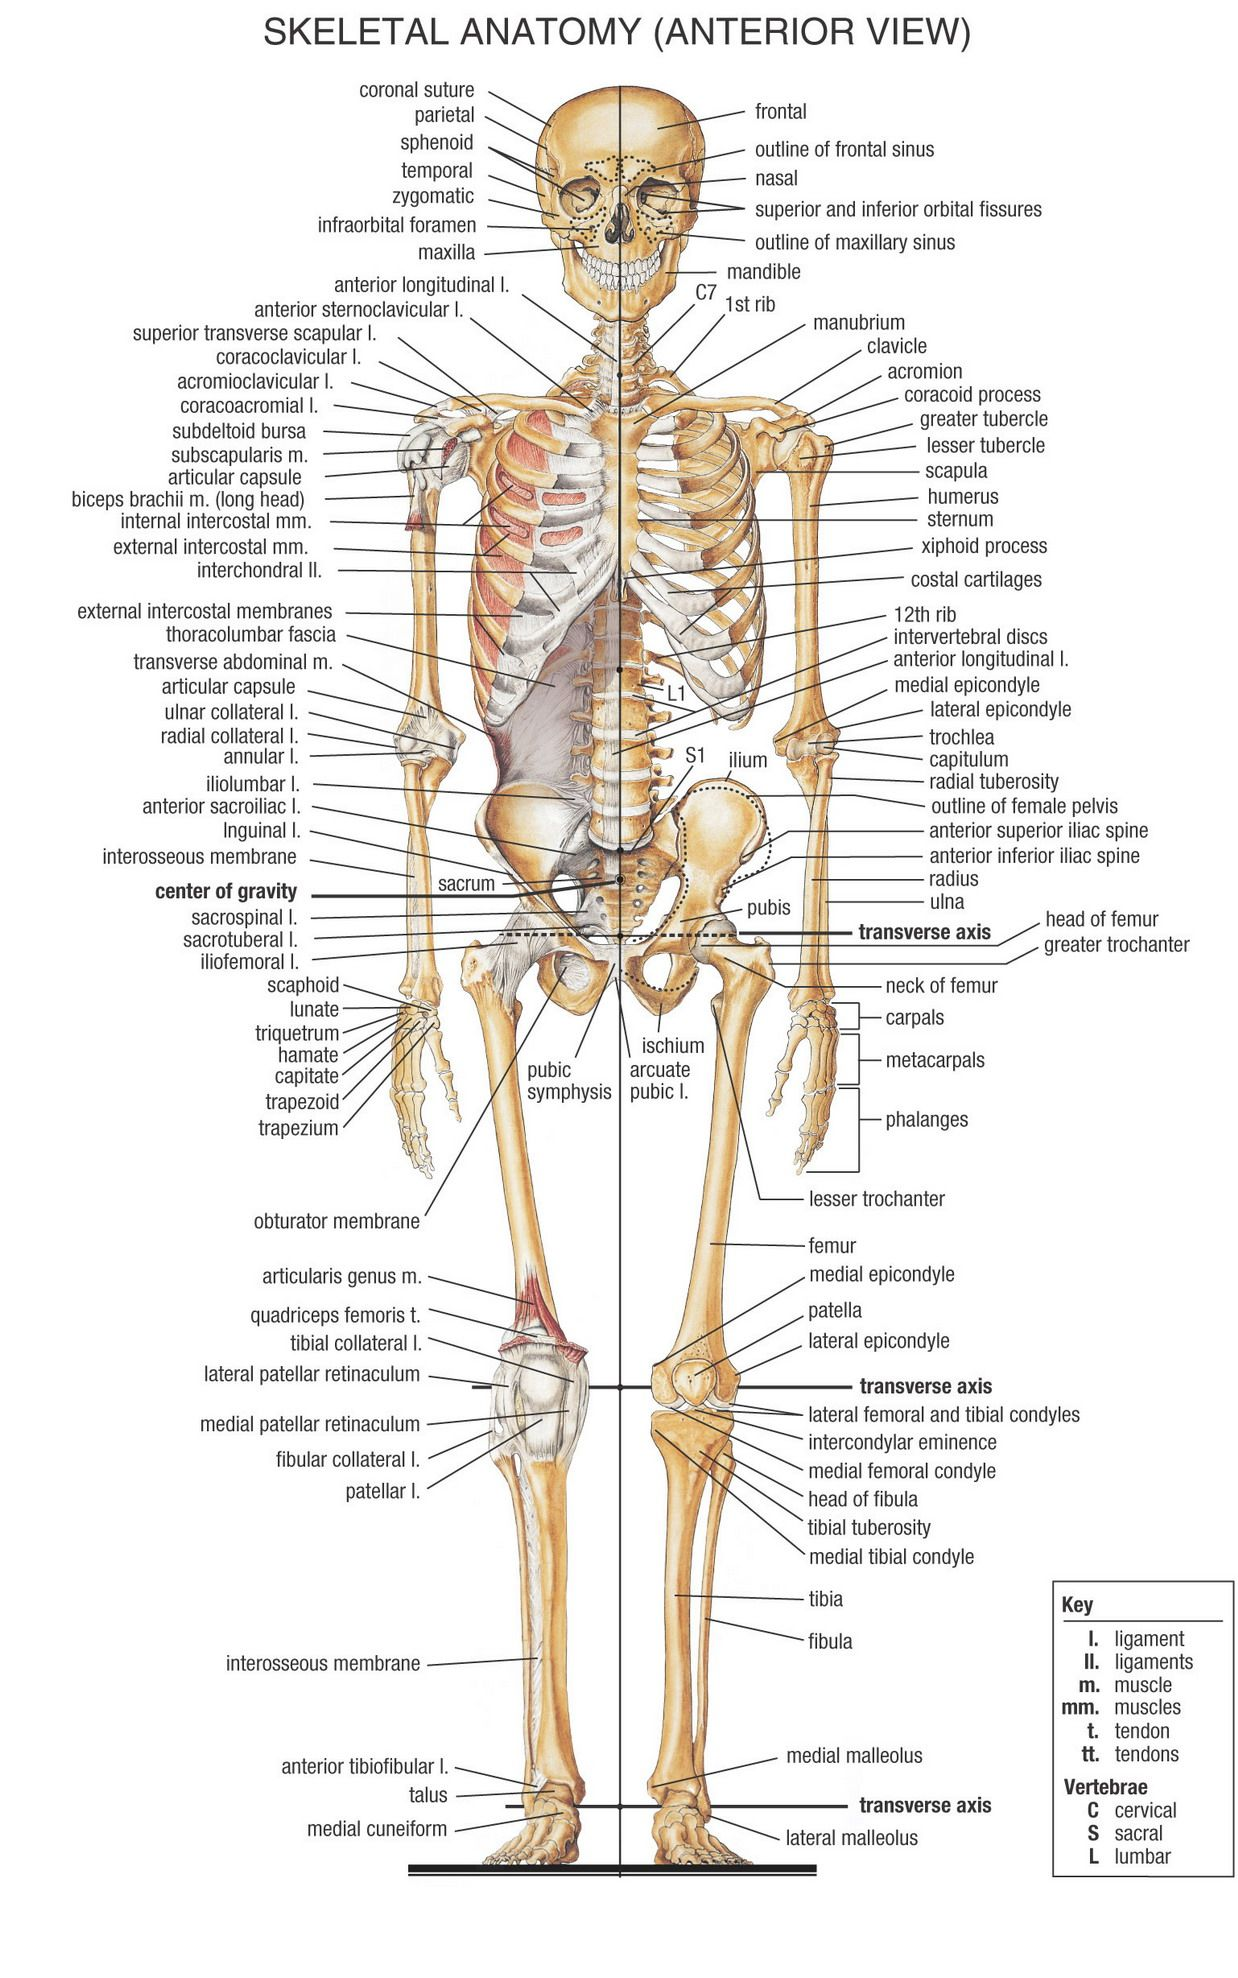 Skeletal Anatomy  The skeletal system in an adult body is